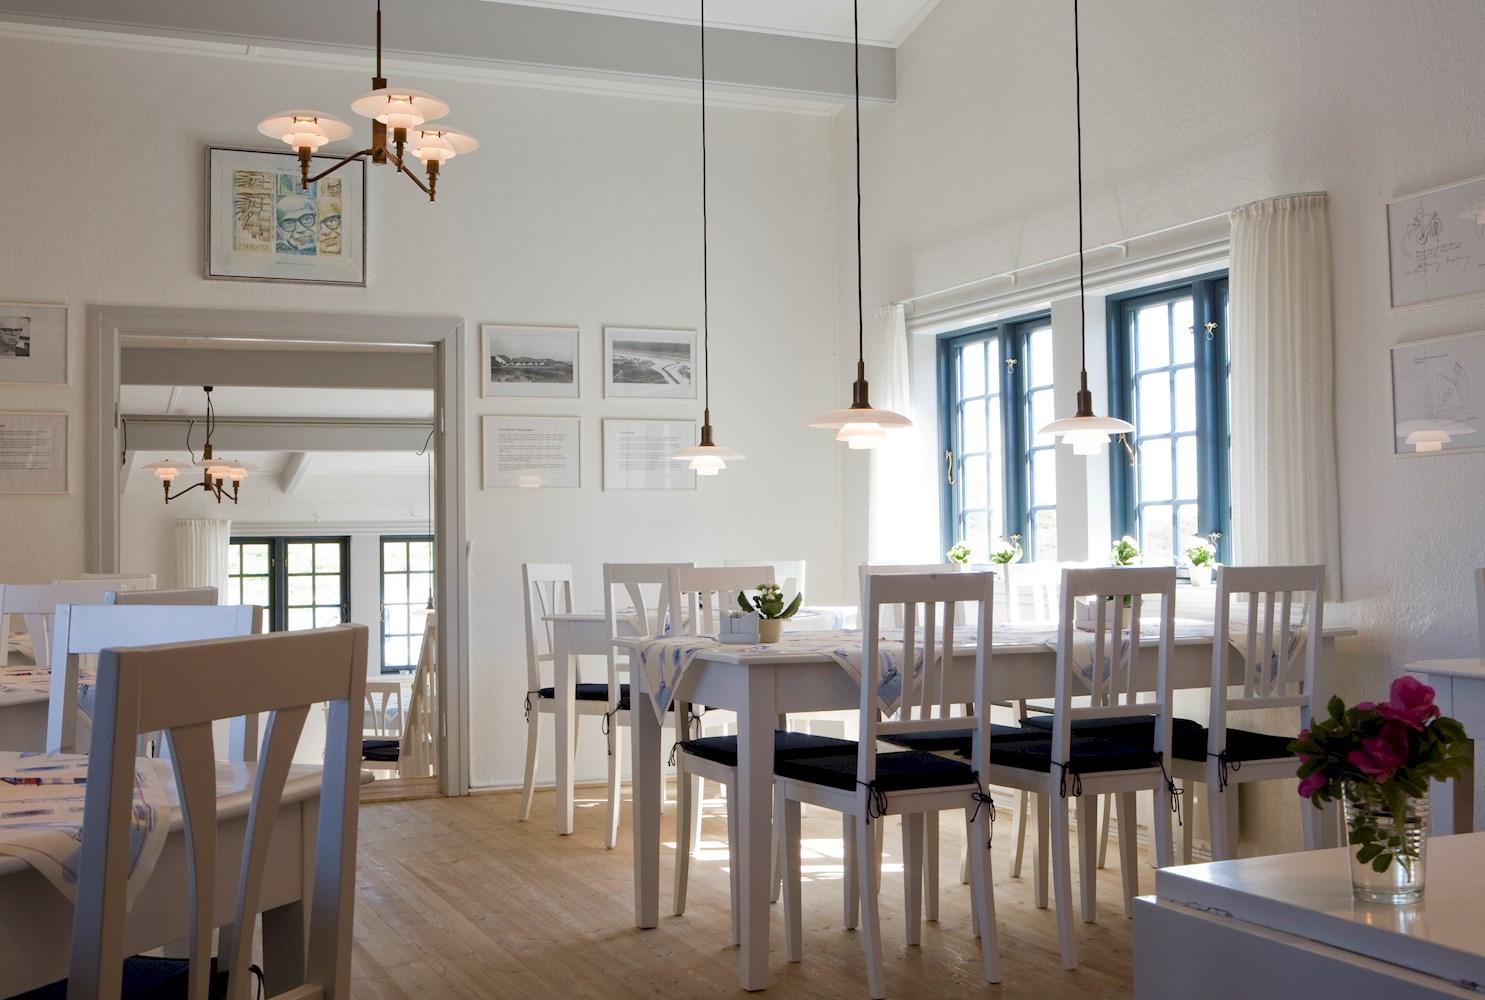 louis poulsen ph 3 2 pendelleuchte nordic urban gmbh. Black Bedroom Furniture Sets. Home Design Ideas